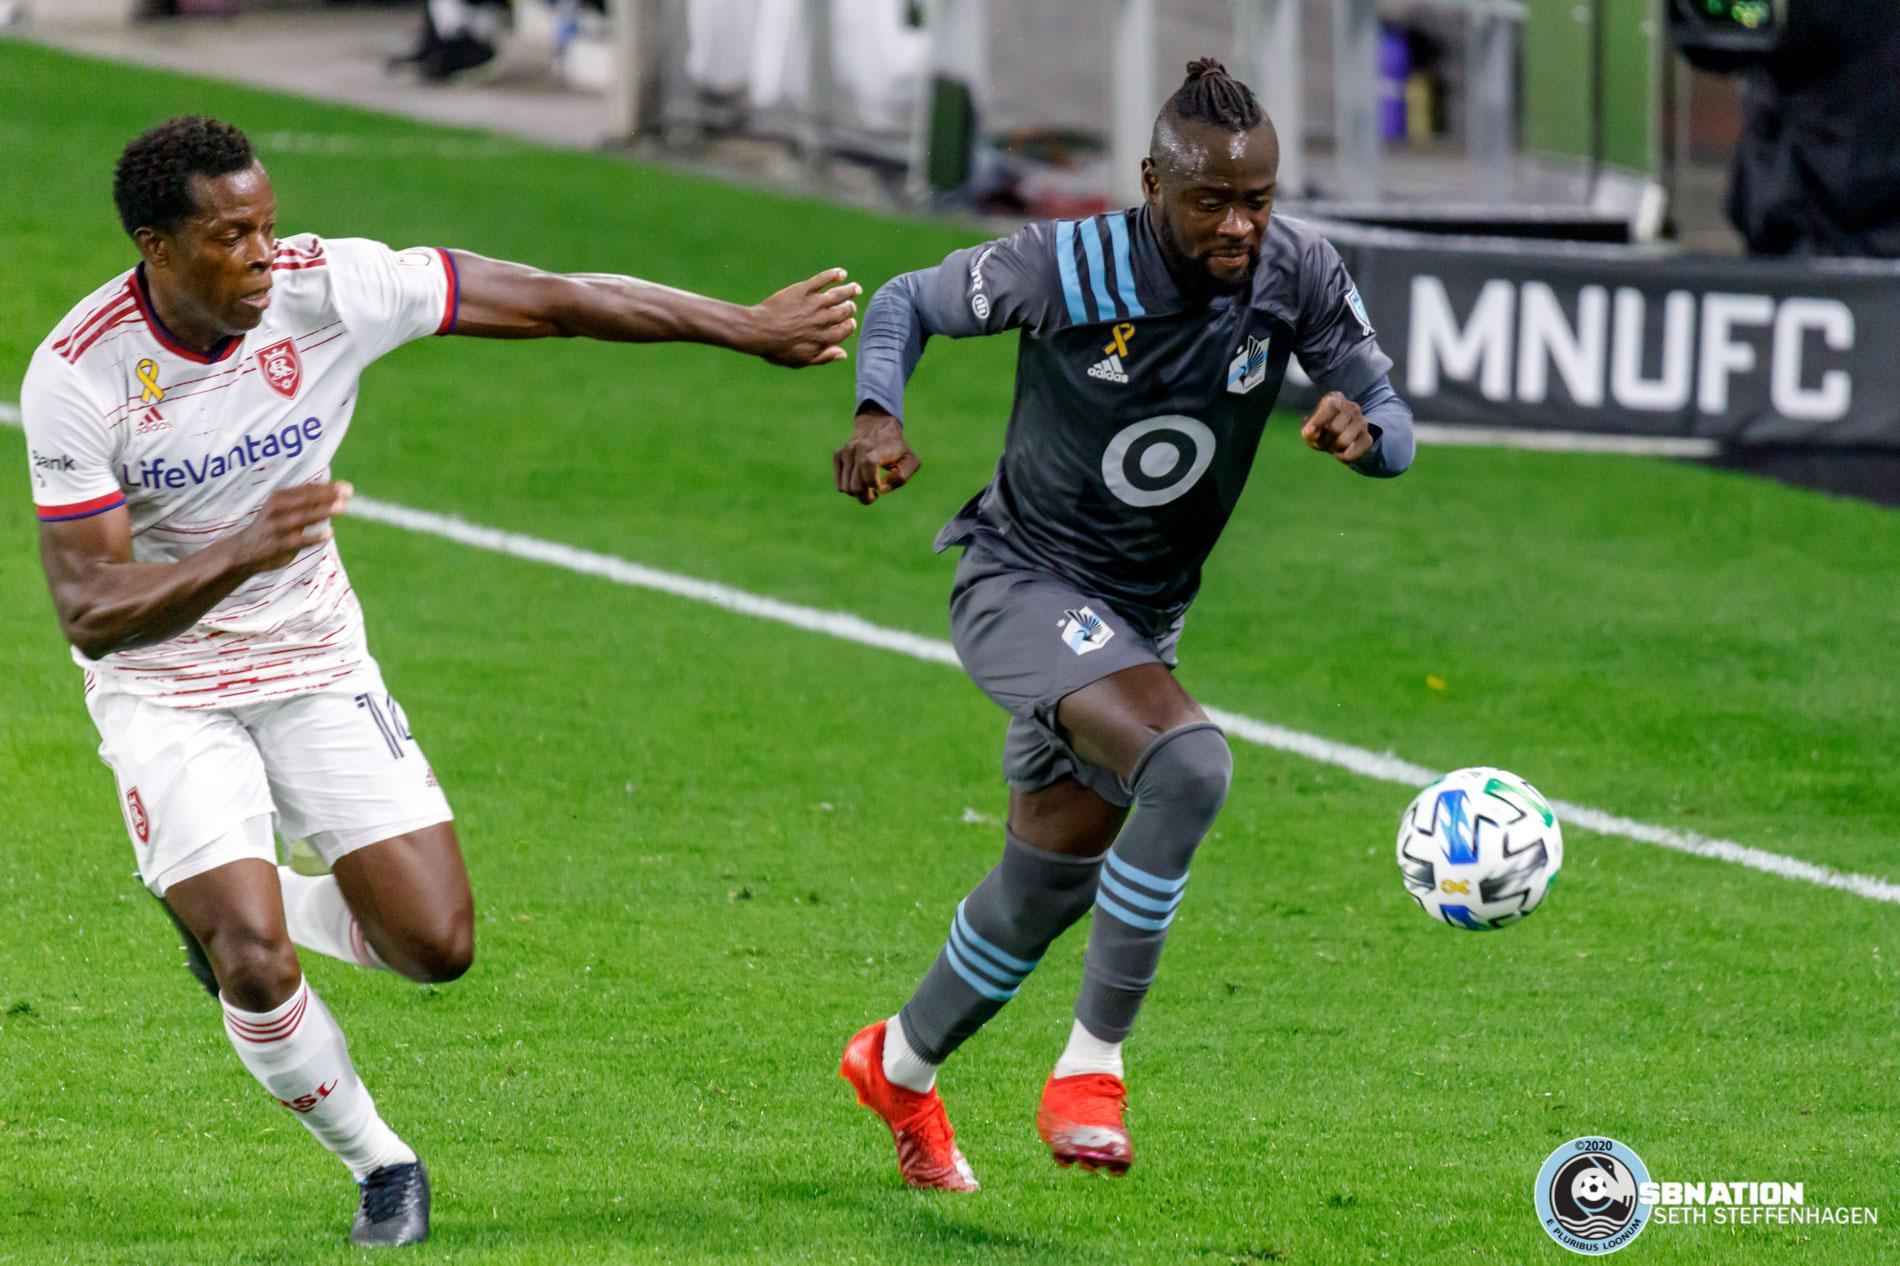 September 27, 2020 - Saint Paul, Minnesota, United States - Real Salt Lake defender Nedum Onuoha (14) chases down Minnesota United forward Kei Kamara (16) during the match at Allianz Field.